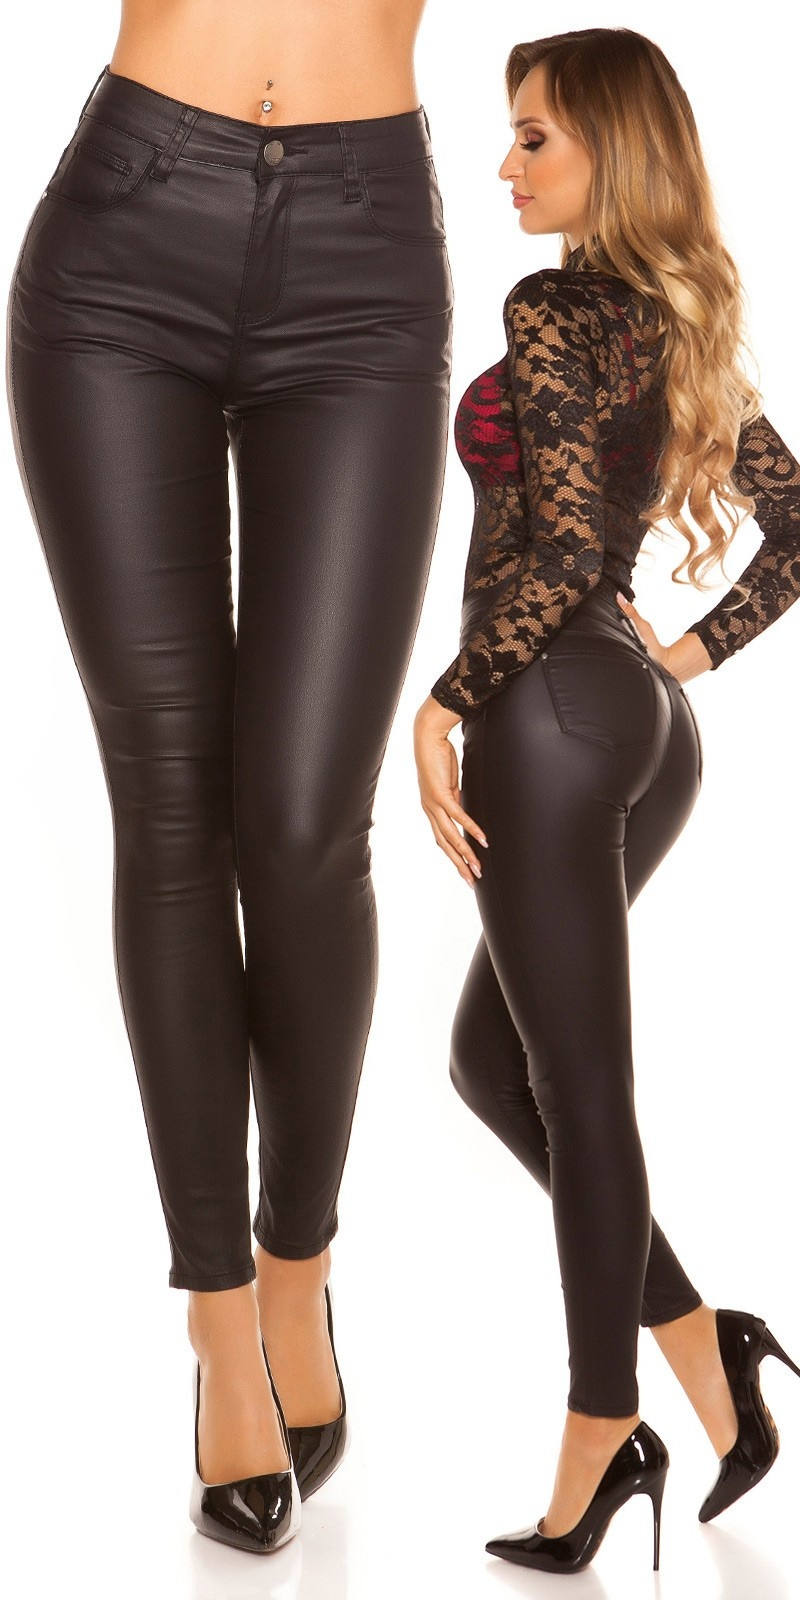 Sexy High Waist Skinny Leatherlook Pants Black